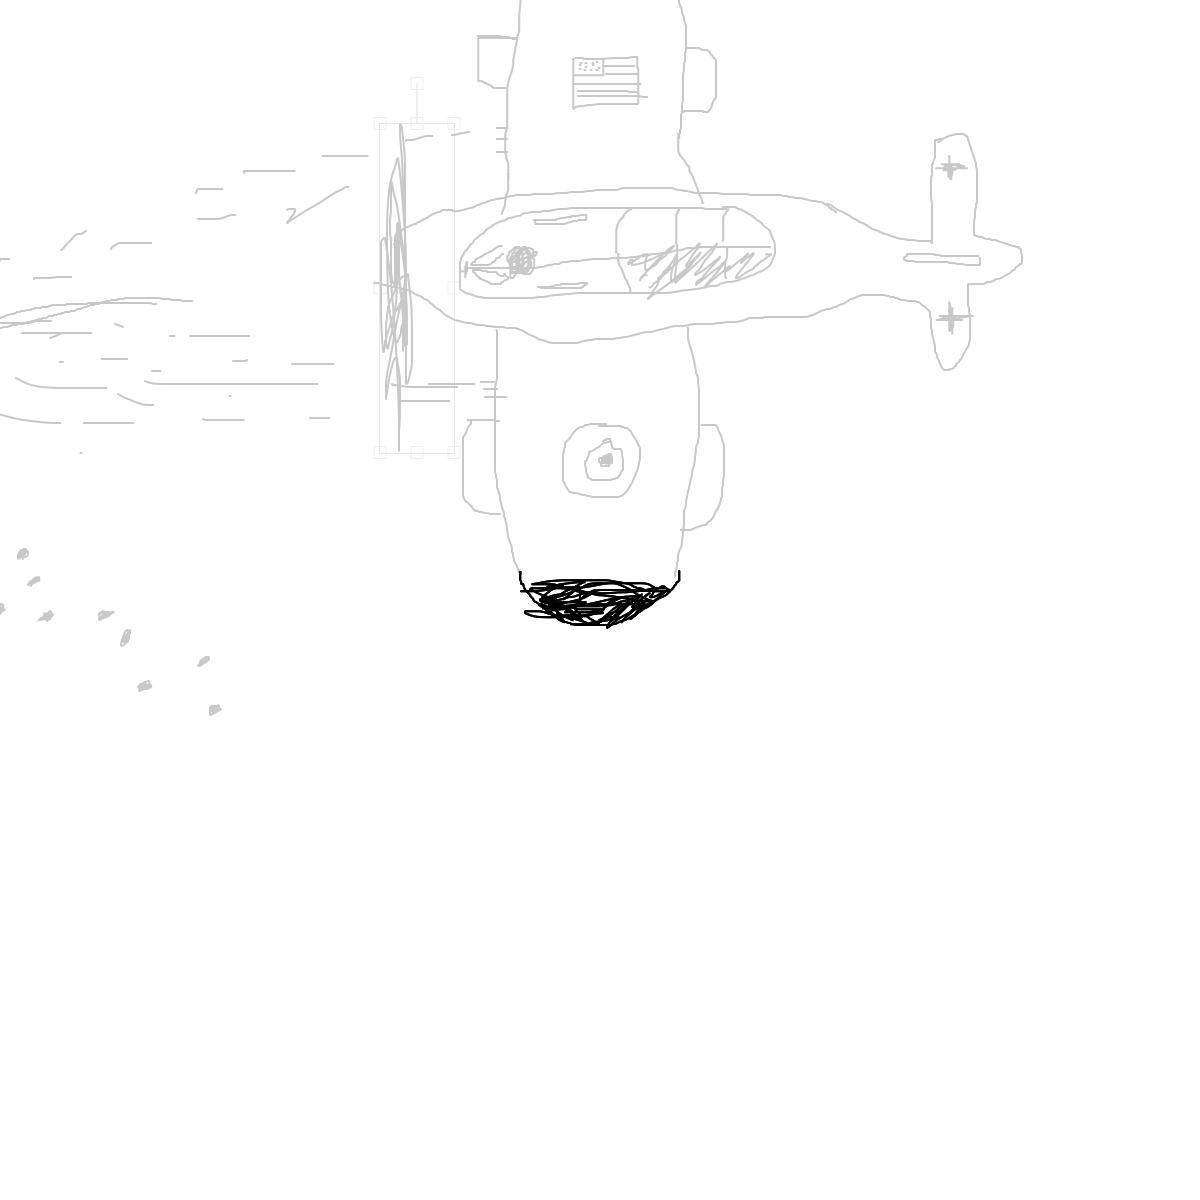 BAAAM drawing#6682 lat:76.5737380981445300lng: 16.3237438201904300